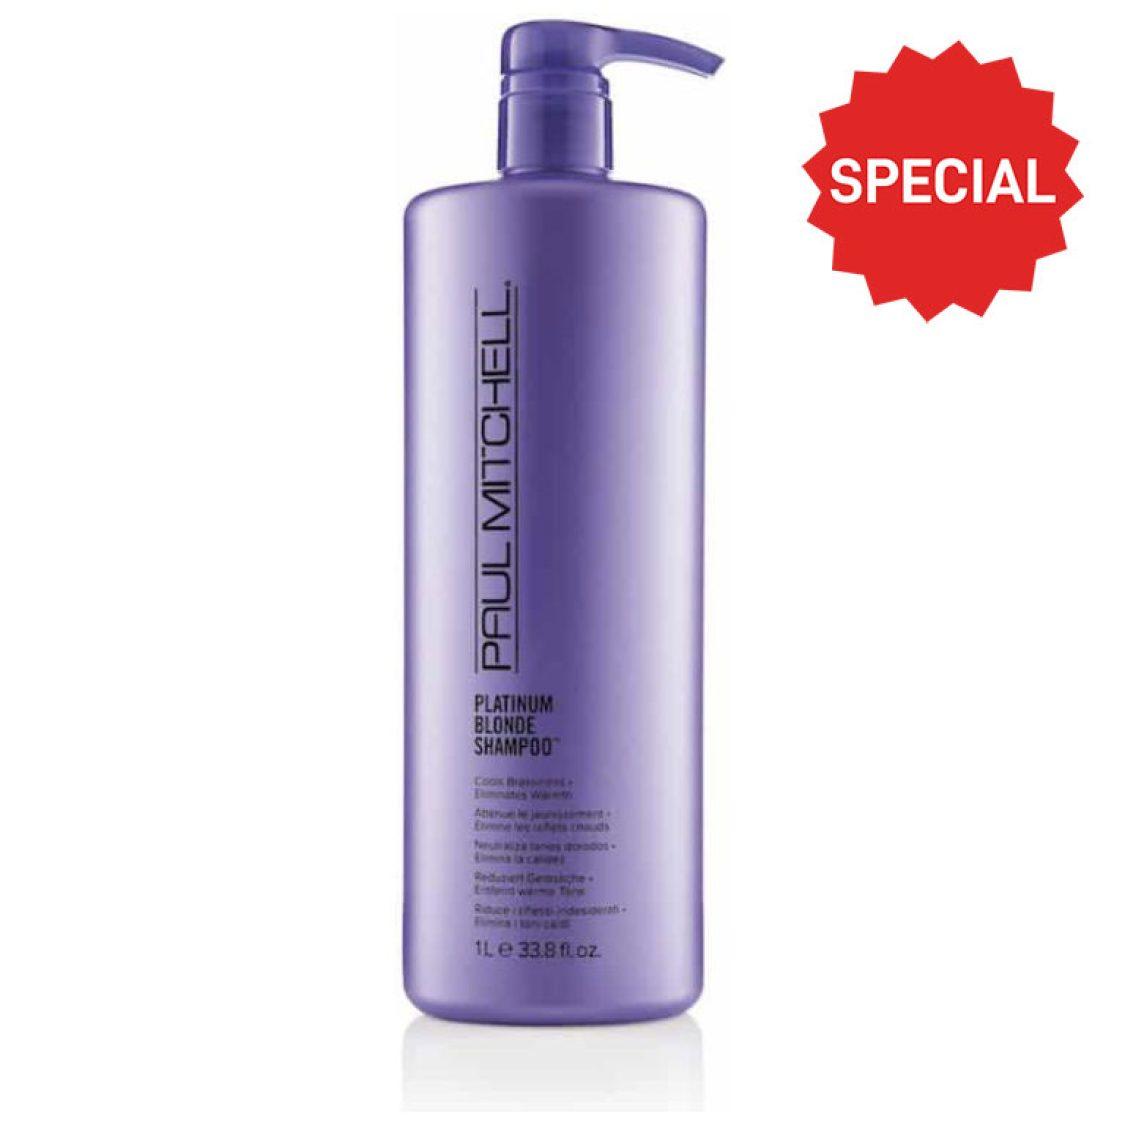 Paul Mitchell - Forever Blonde - Color Shampoo Platinum Blonde 1 Litre